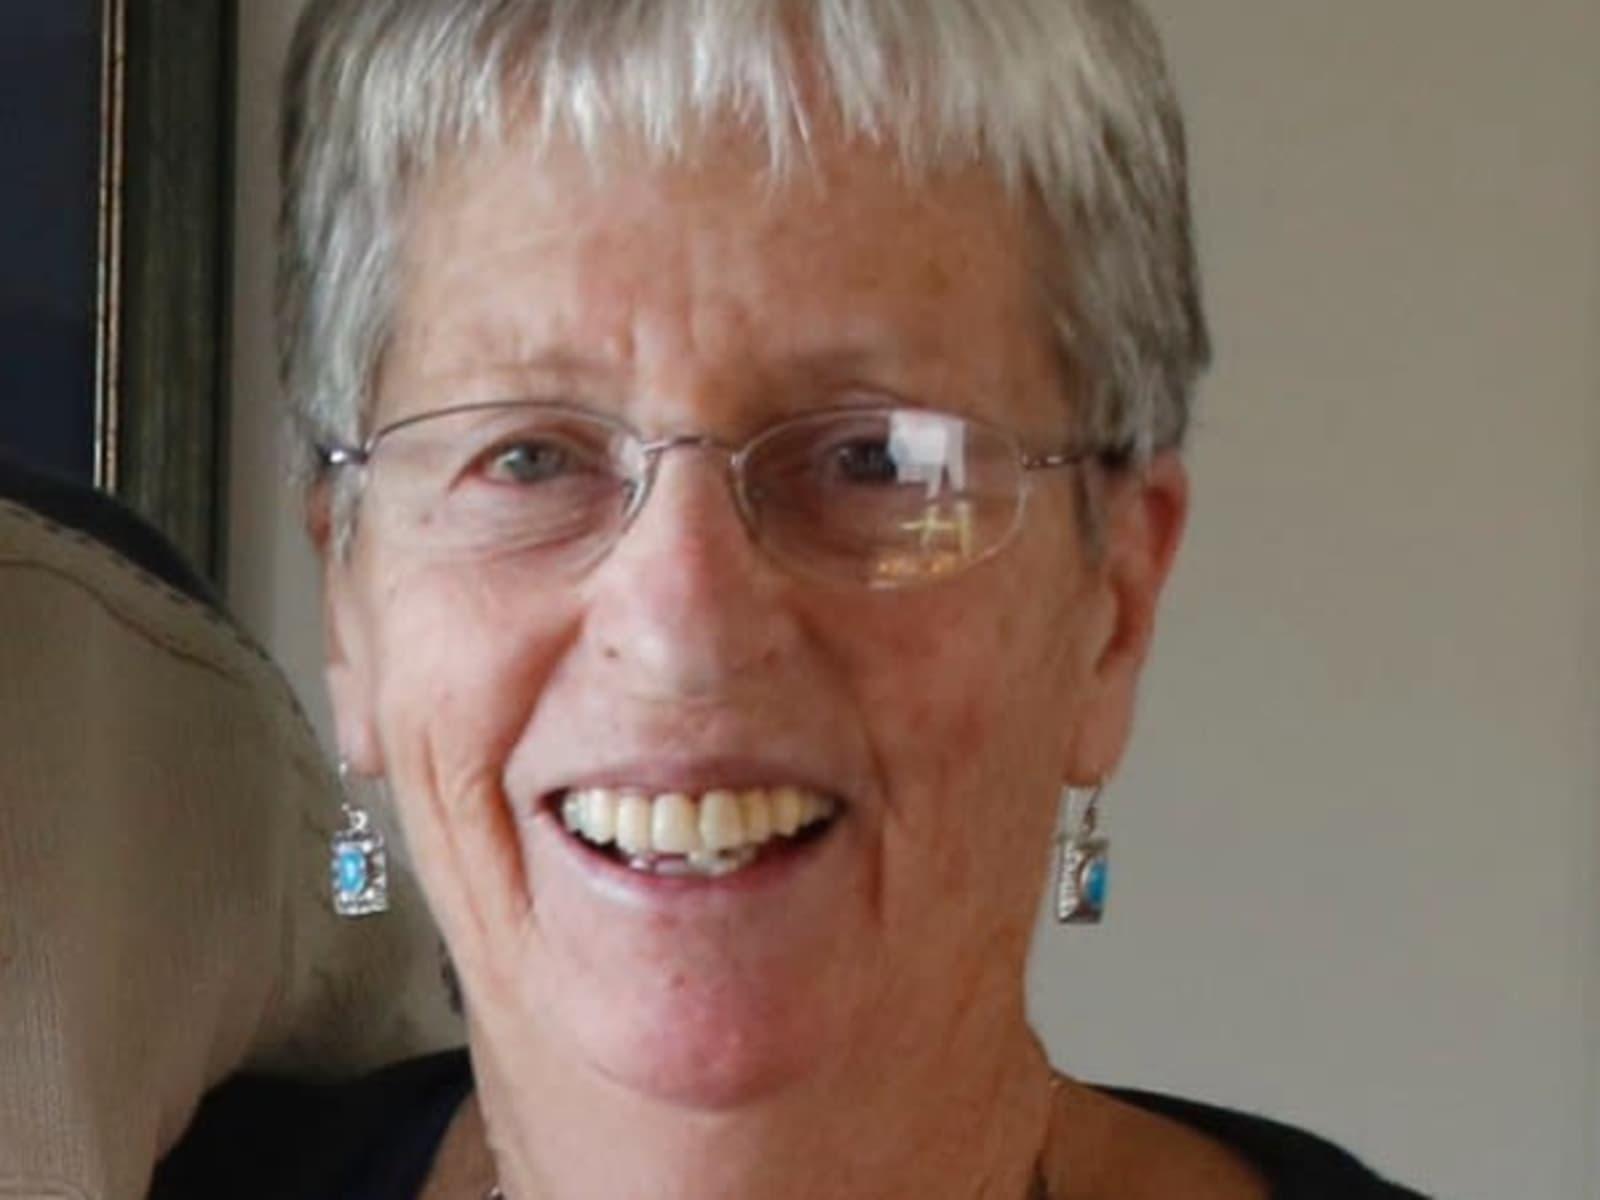 Beverly from Dunedin, New Zealand